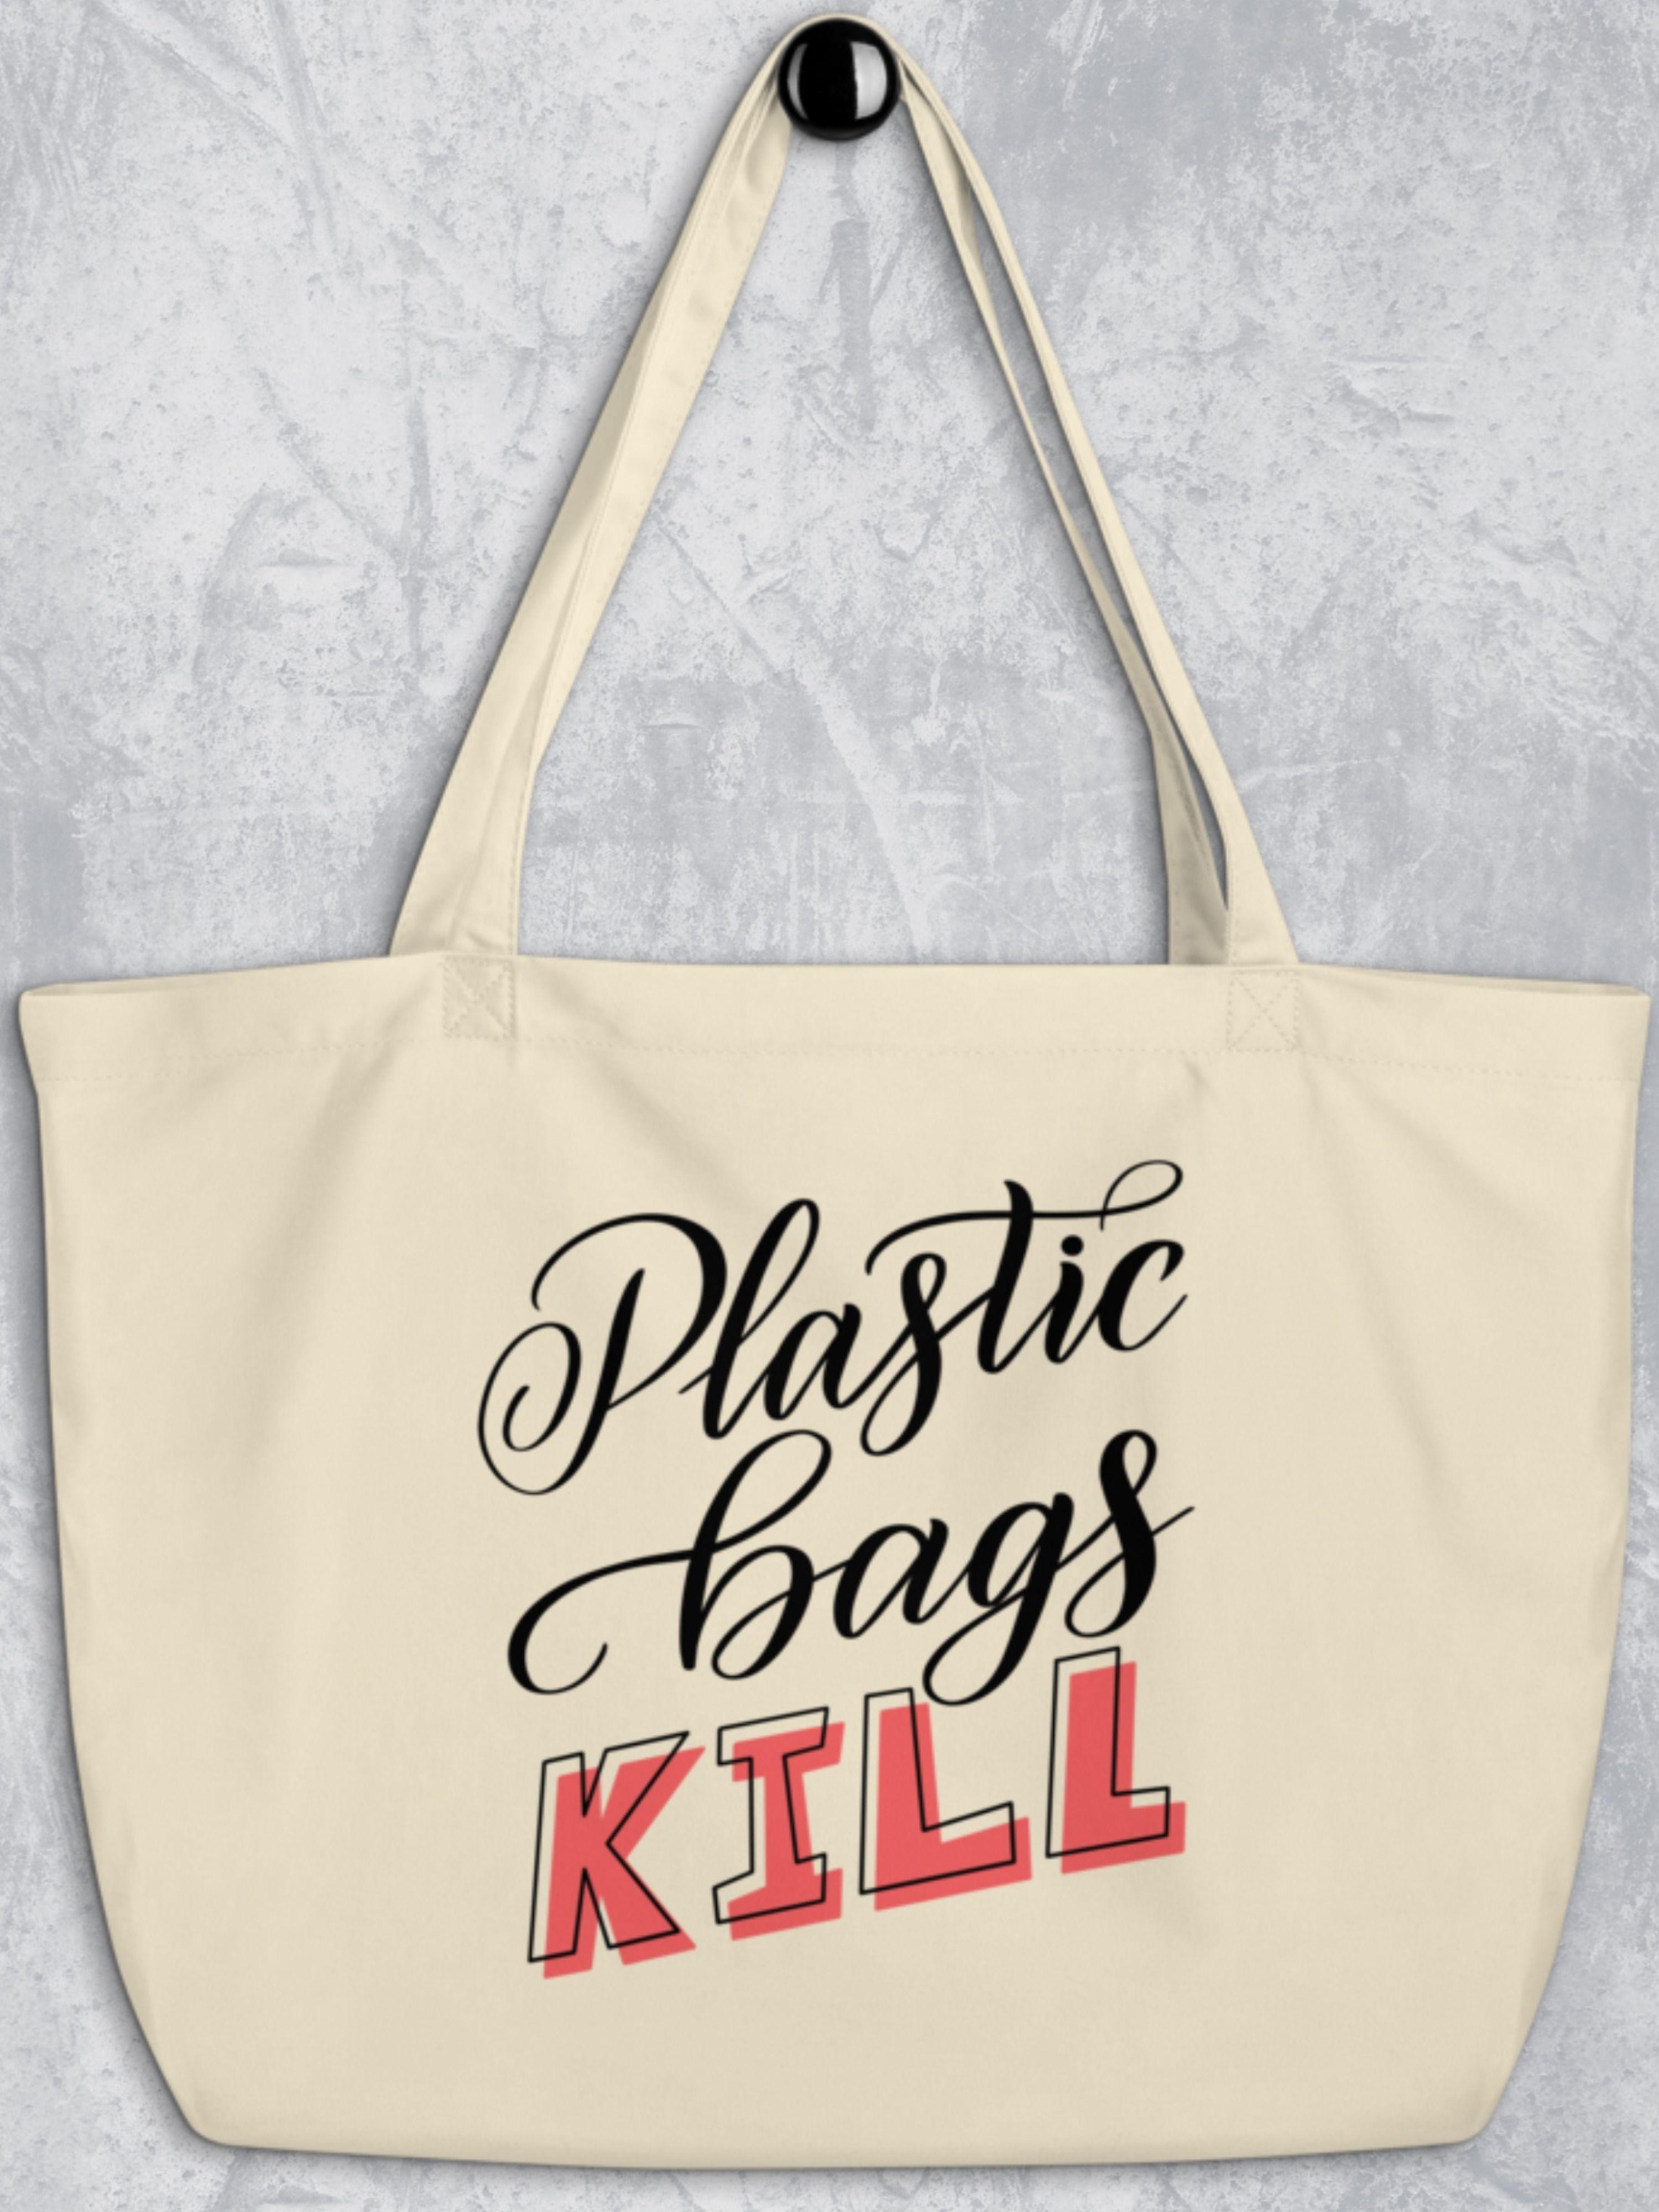 Plastic Bags Kill Grocery Tote Bag